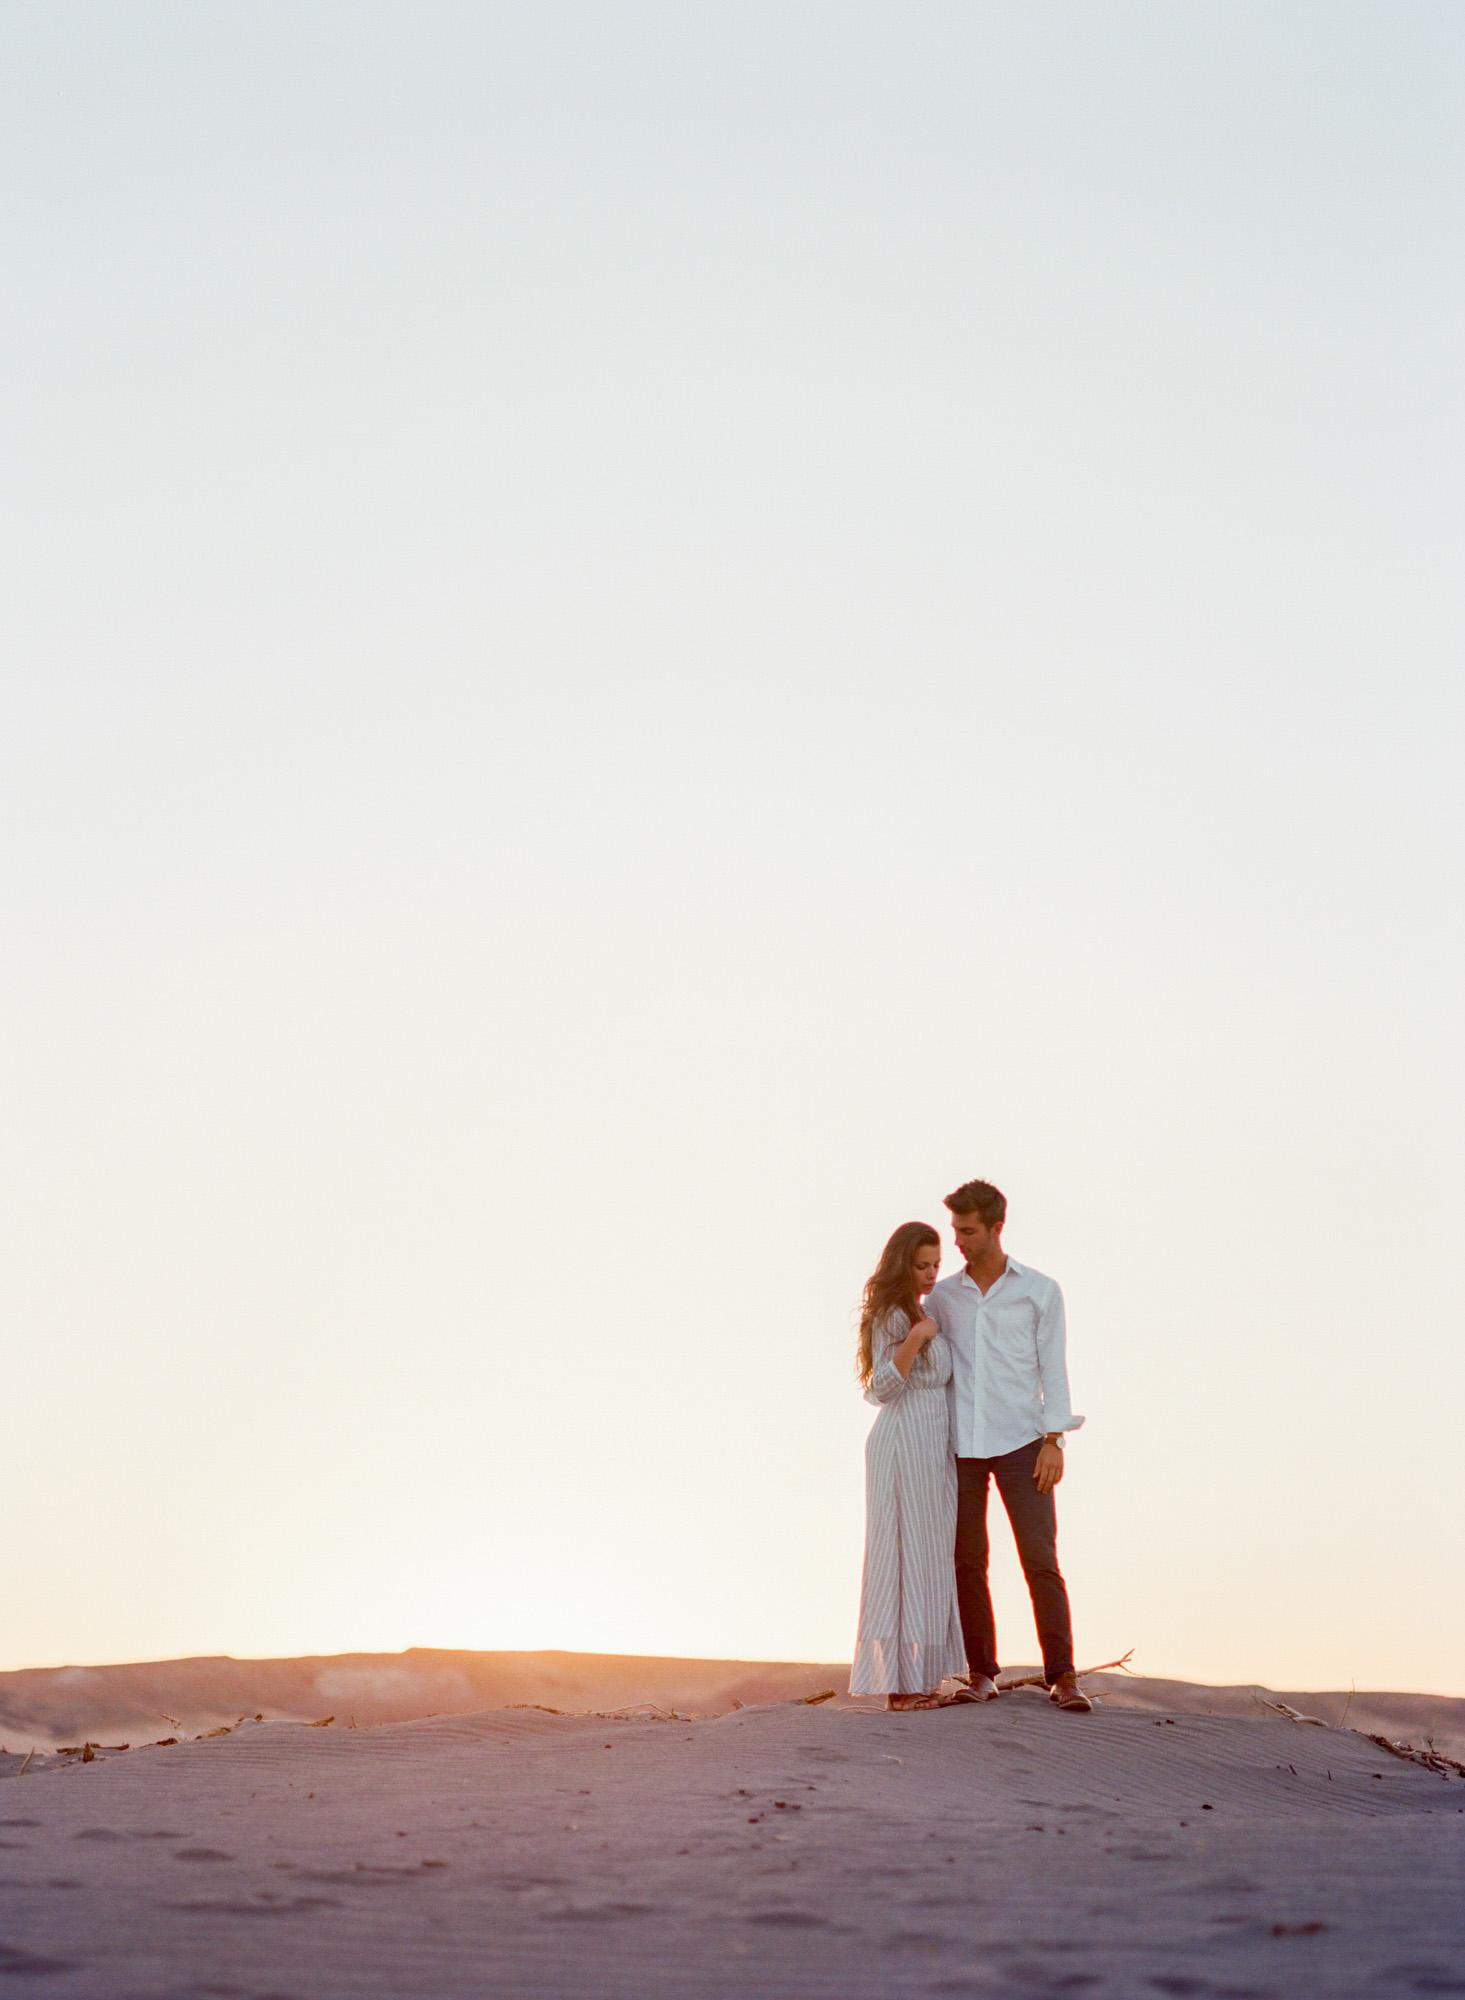 boise-idaho-film-wedding-photographer-39.jpg